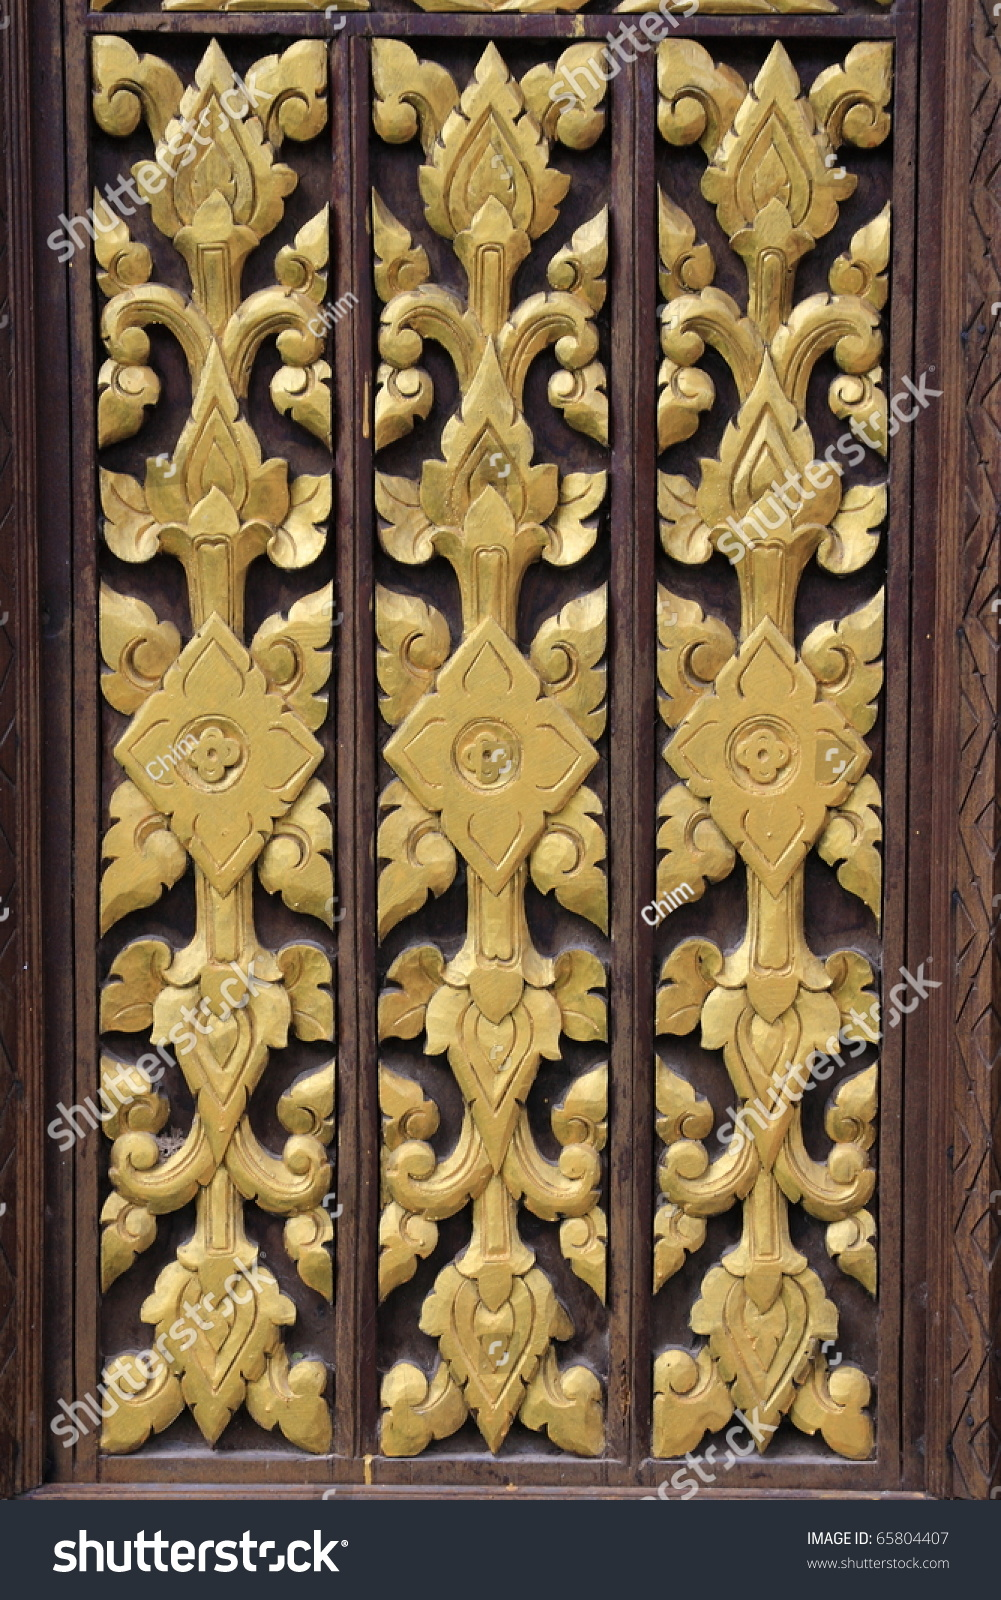 Wall Panel Yellow Painted Wood Craft Stock Photo 65804407 - Shutterstock